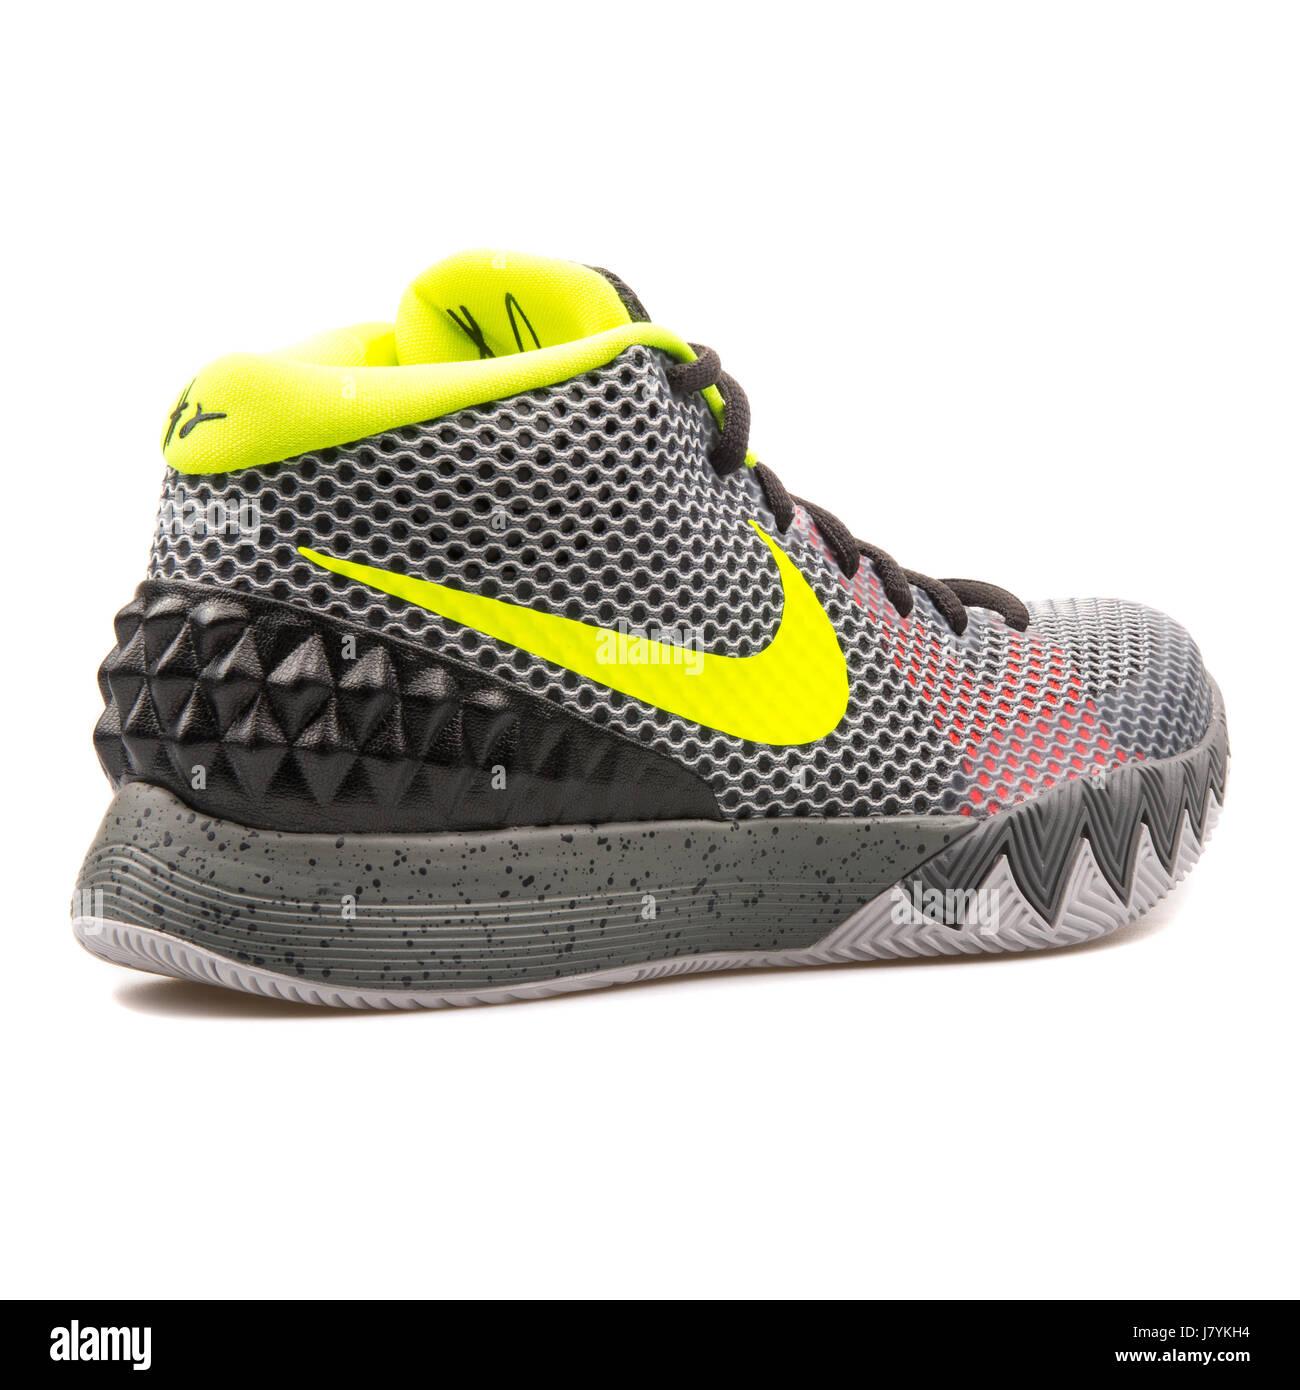 the latest 7b125 0da50 Nike Kyrie 1 Men's Grey Basketball Sneakers - 705277-270 ...